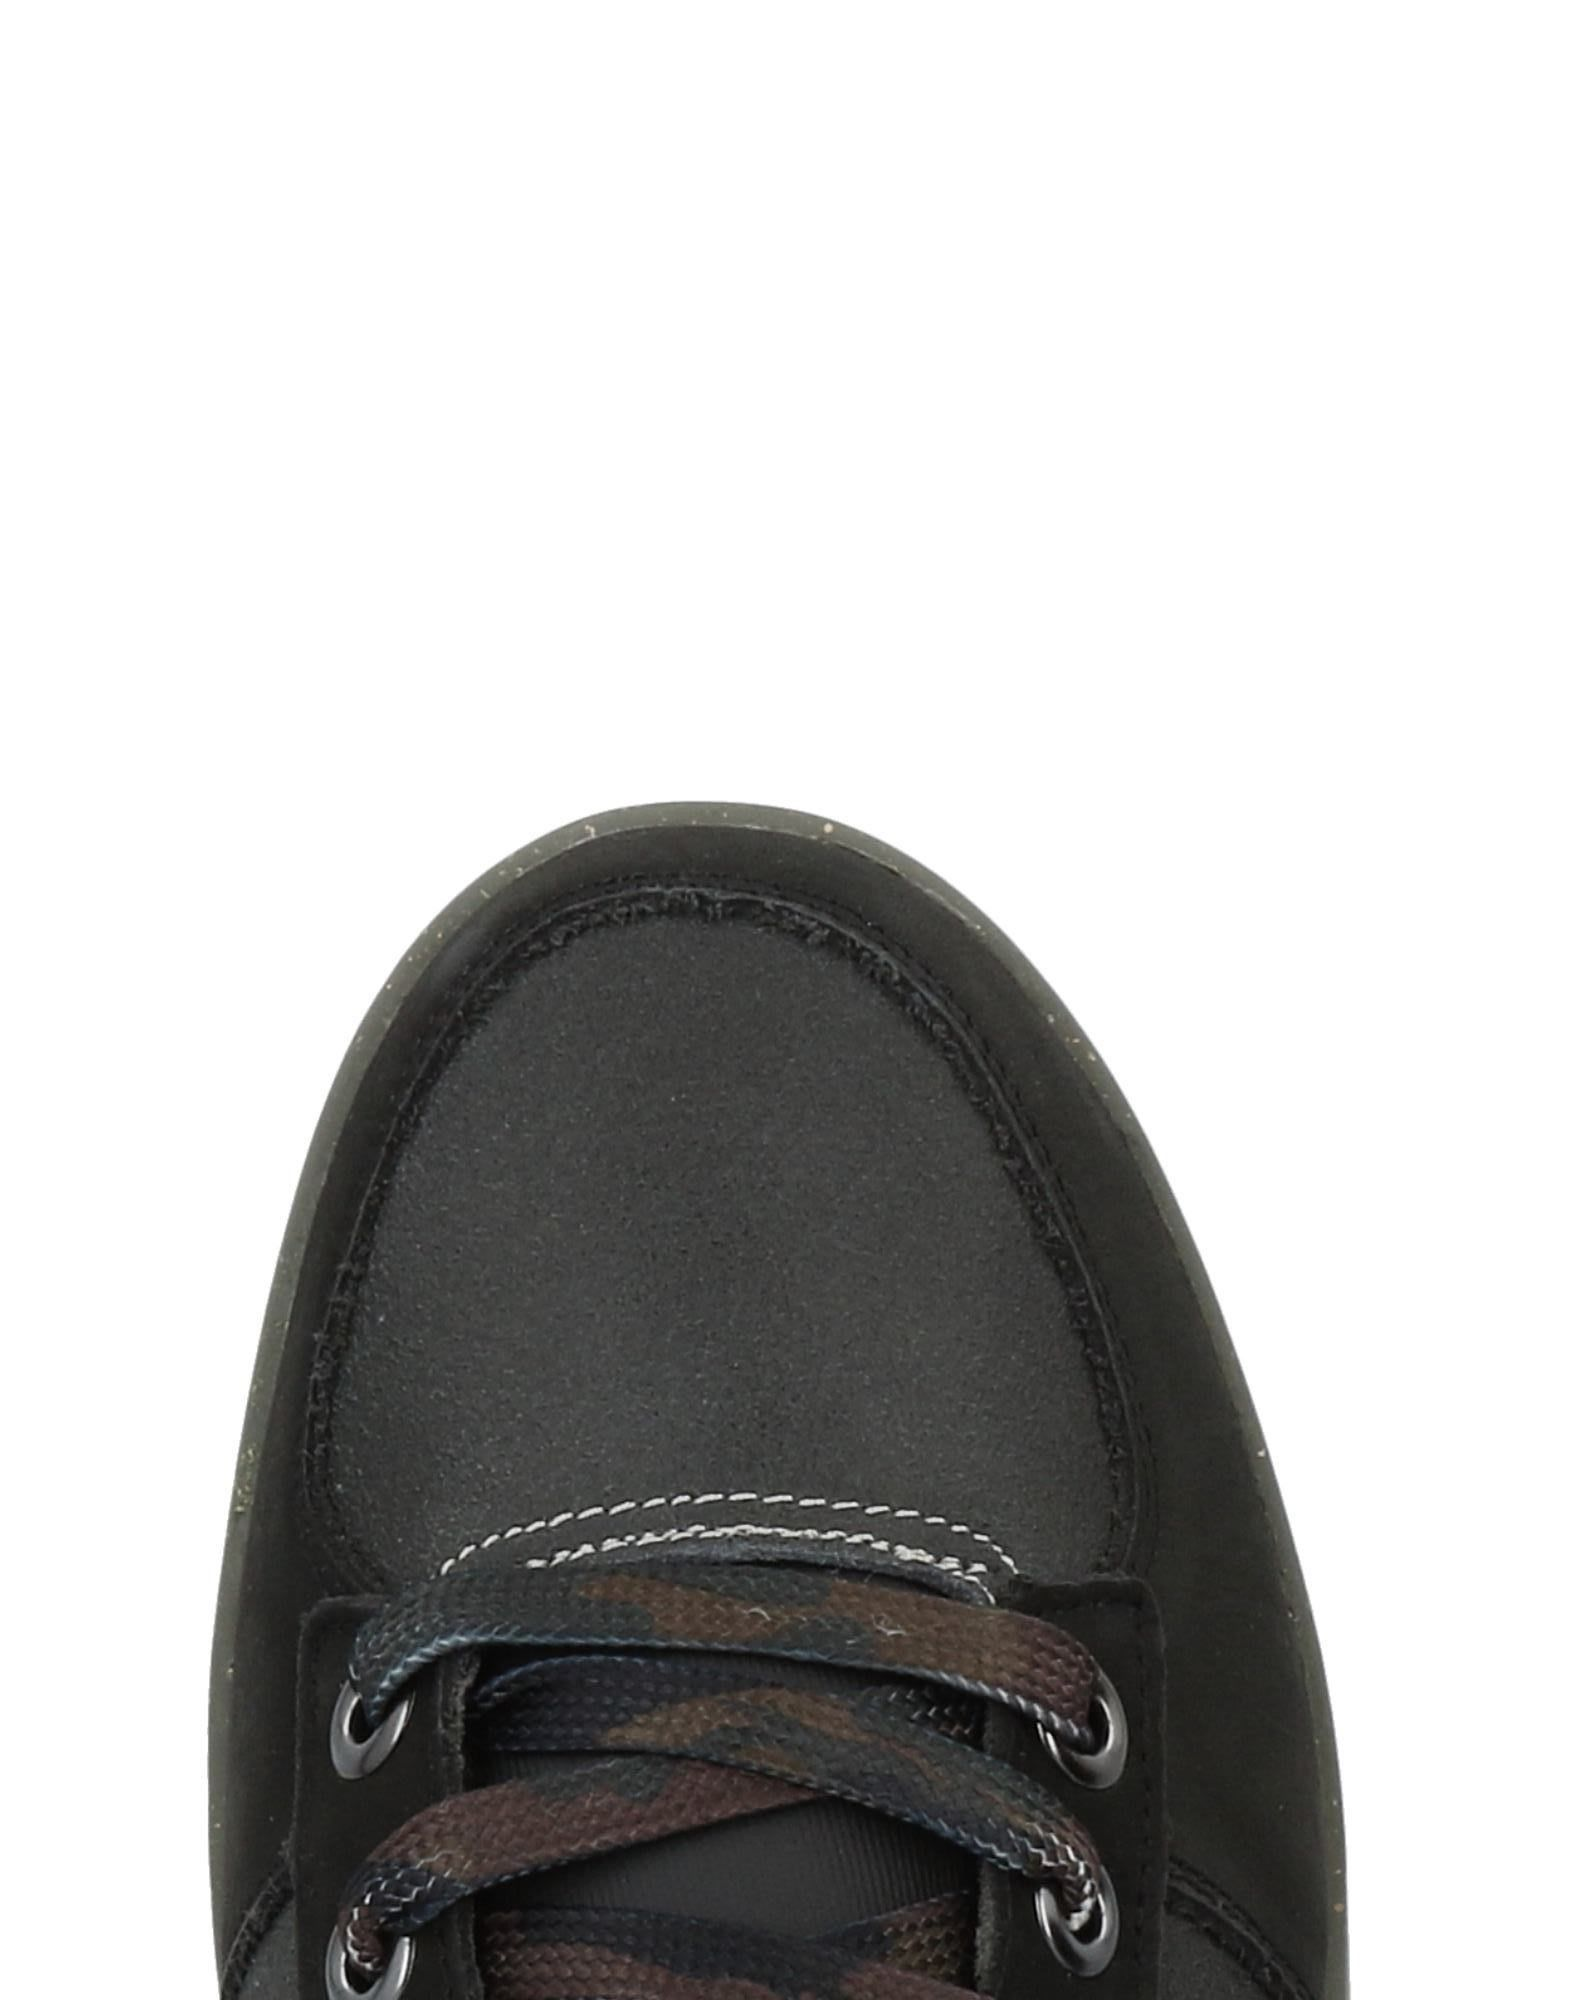 Replay Sneakers Herren Heiße  11463093AJ Heiße Herren Schuhe 9a08d6